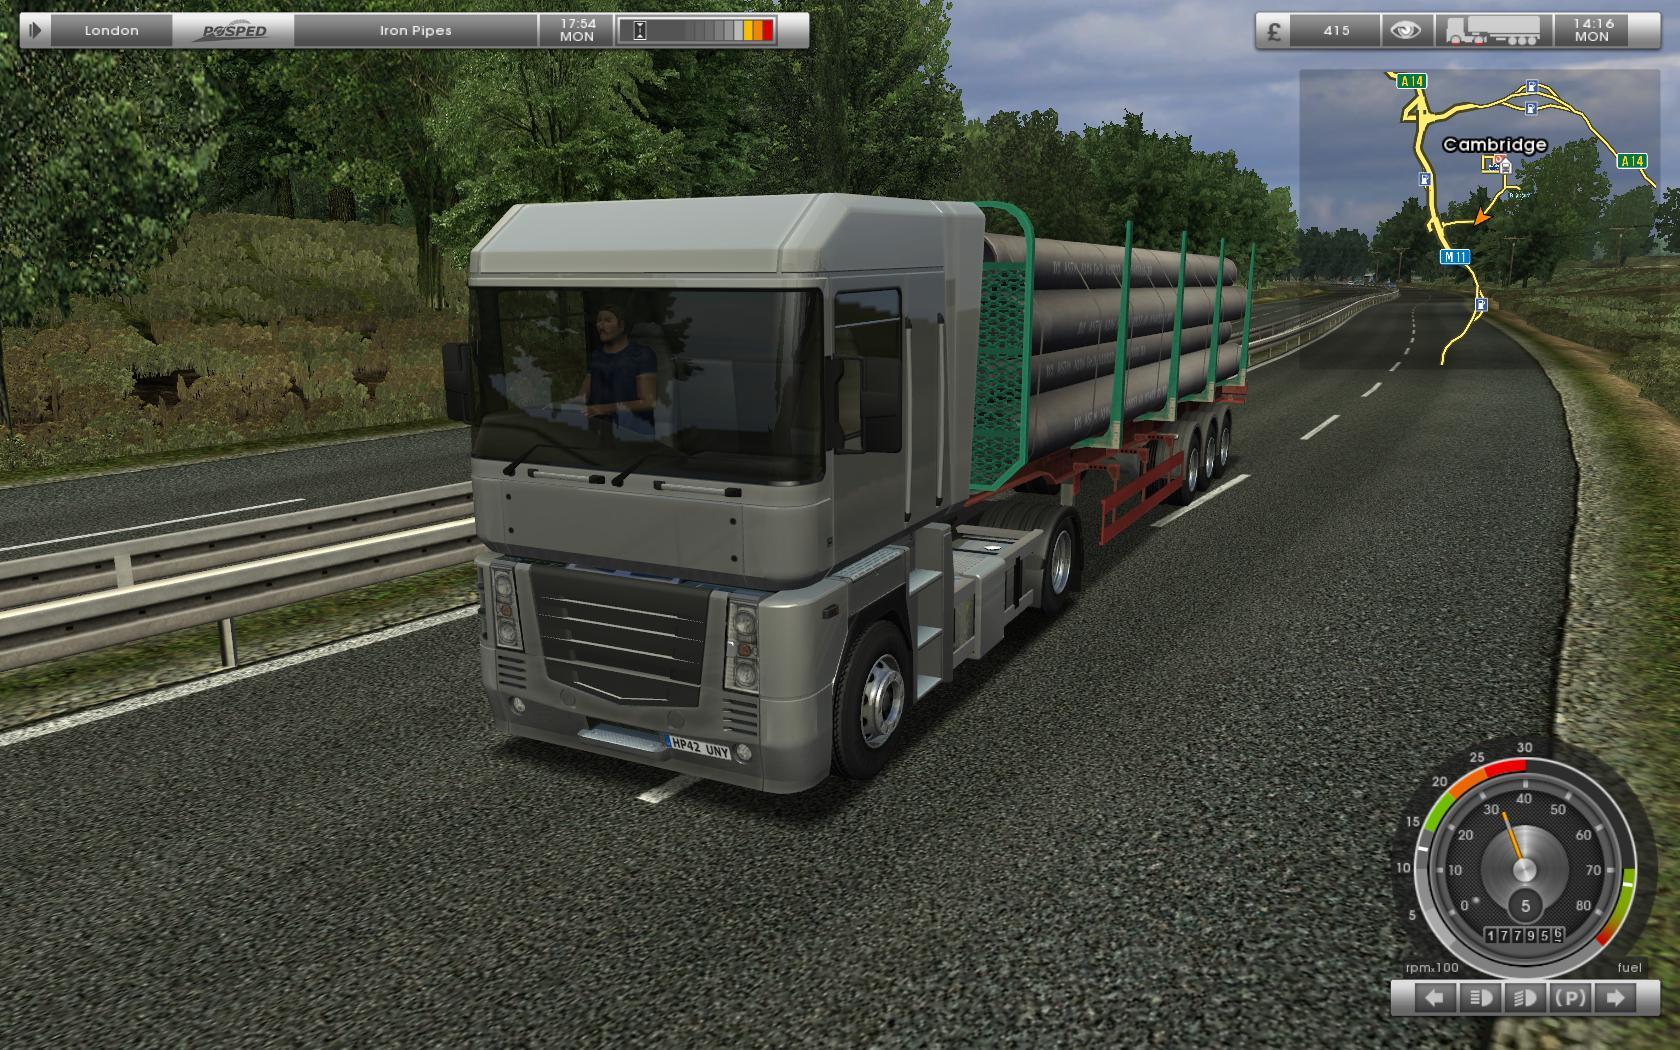 uk truck simulator screenshots video game news videos. Black Bedroom Furniture Sets. Home Design Ideas